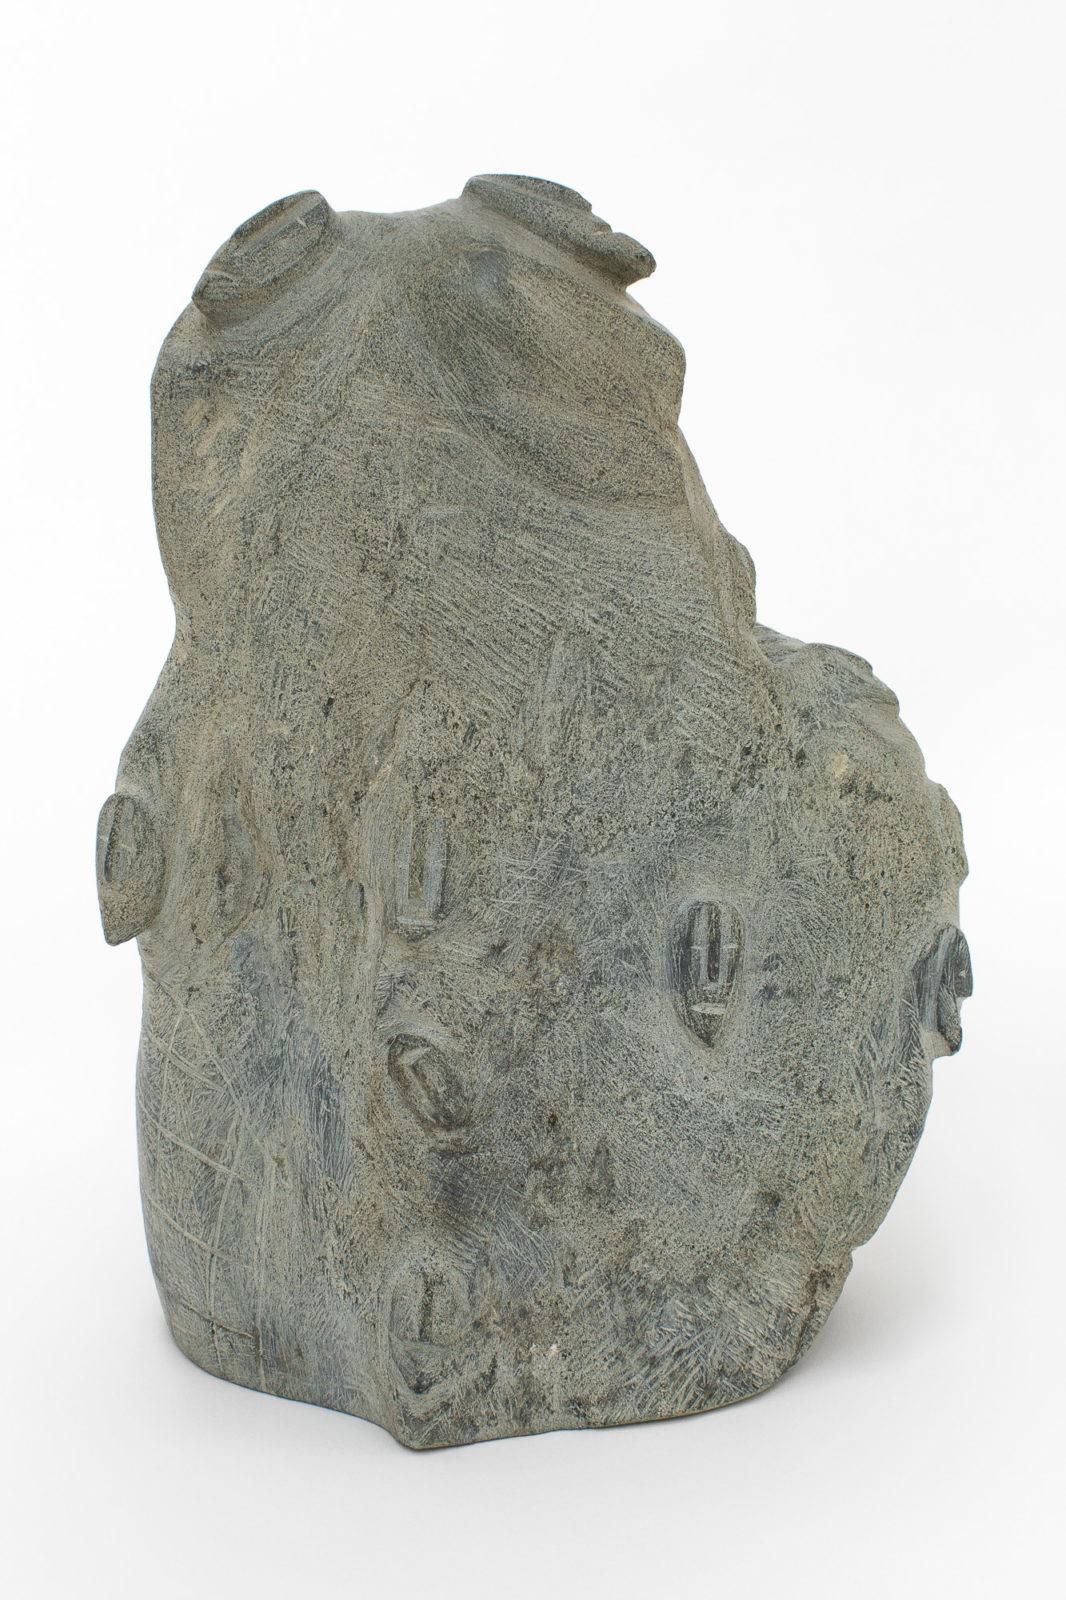 Lucy Tasseor Tutsweetuk - untitled (with large igloo)